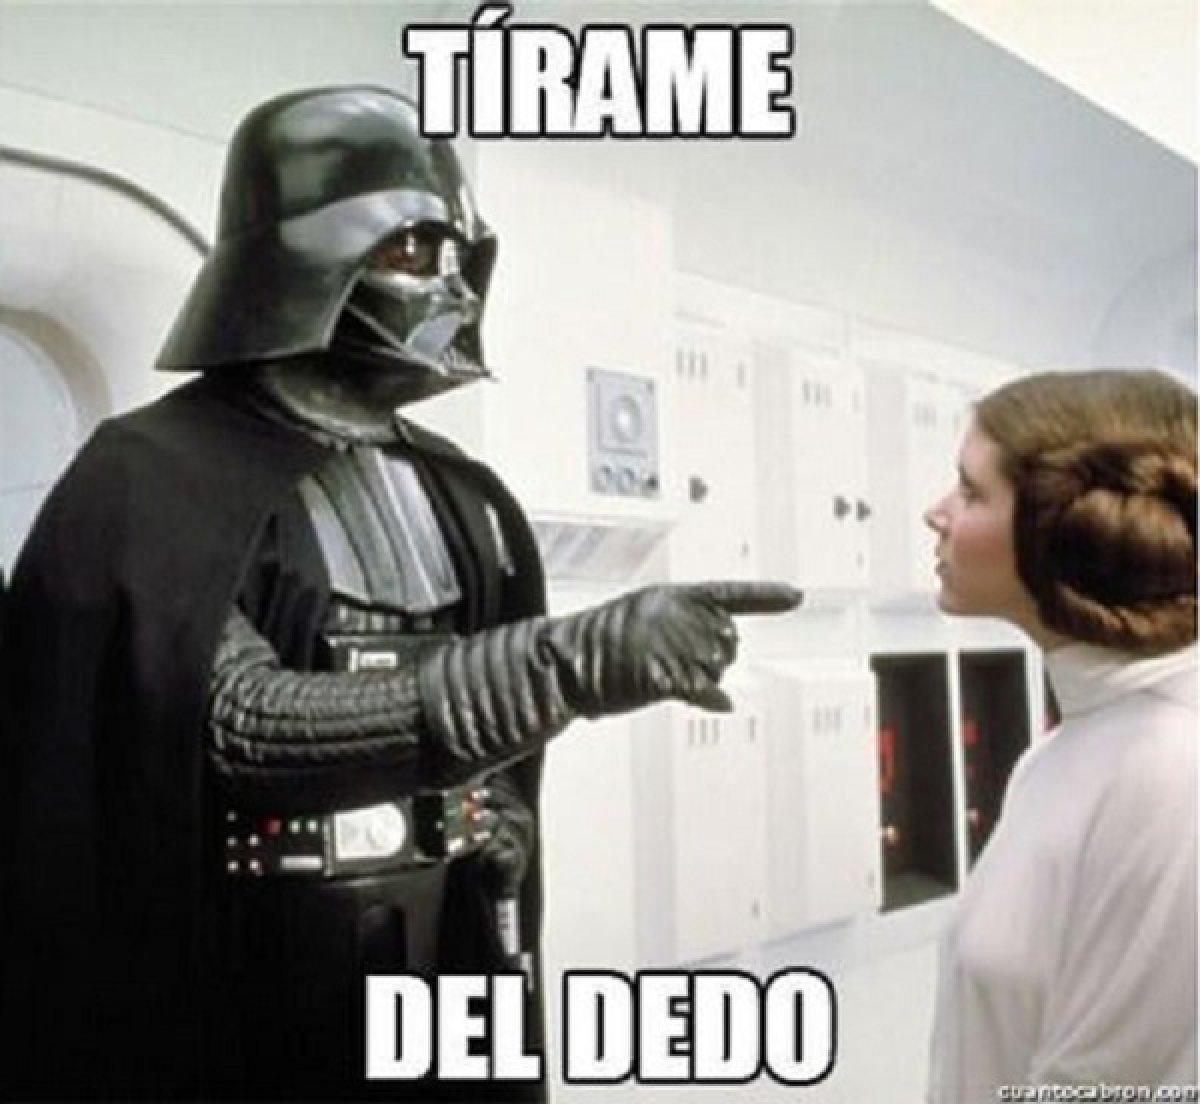 memes de star wars12